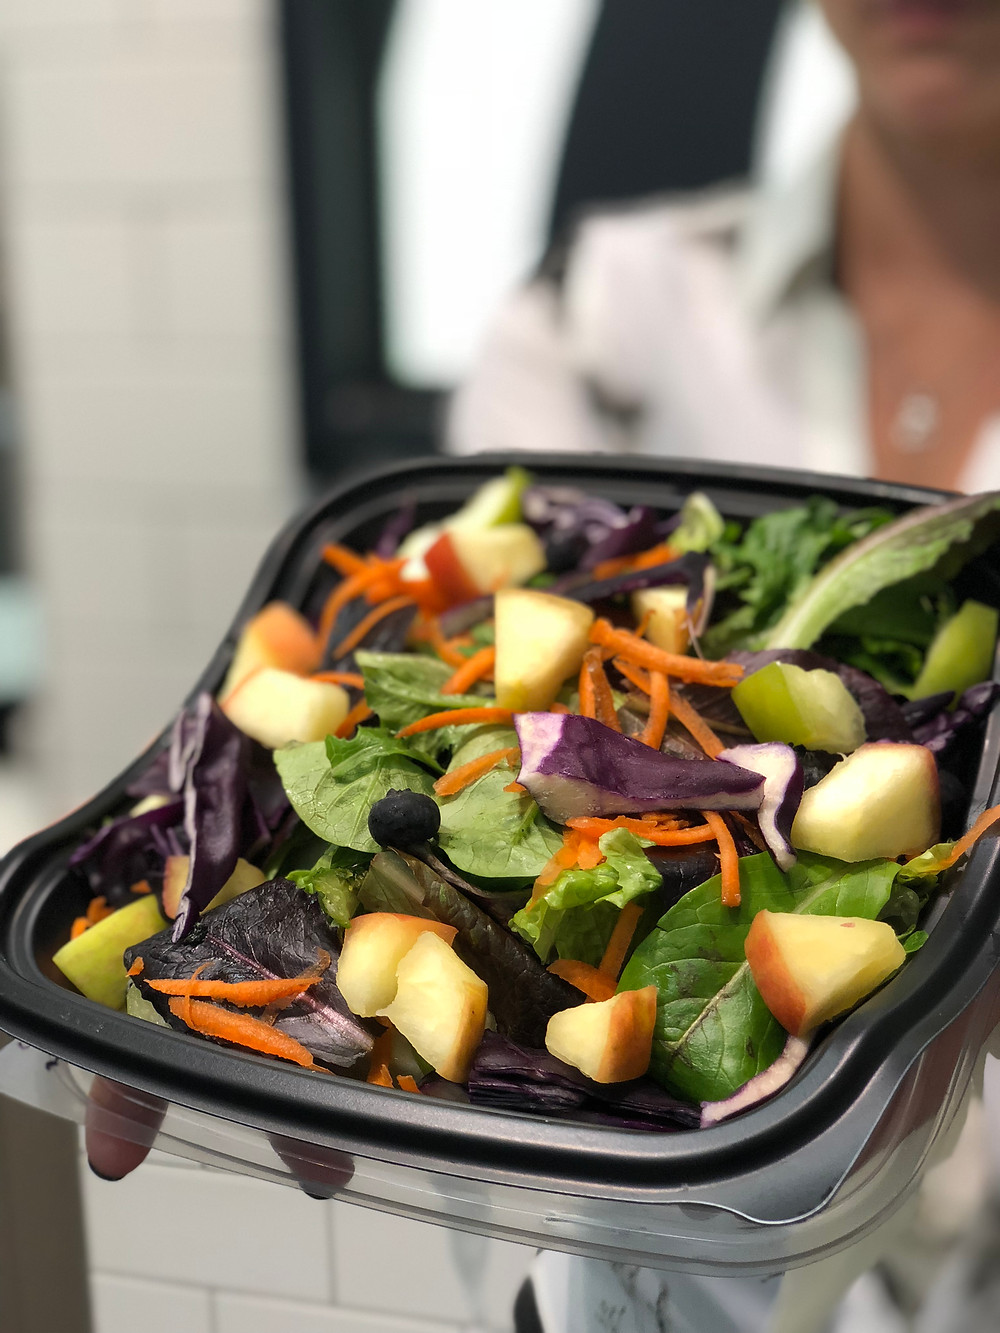 A salad from Chik-Fil-A.